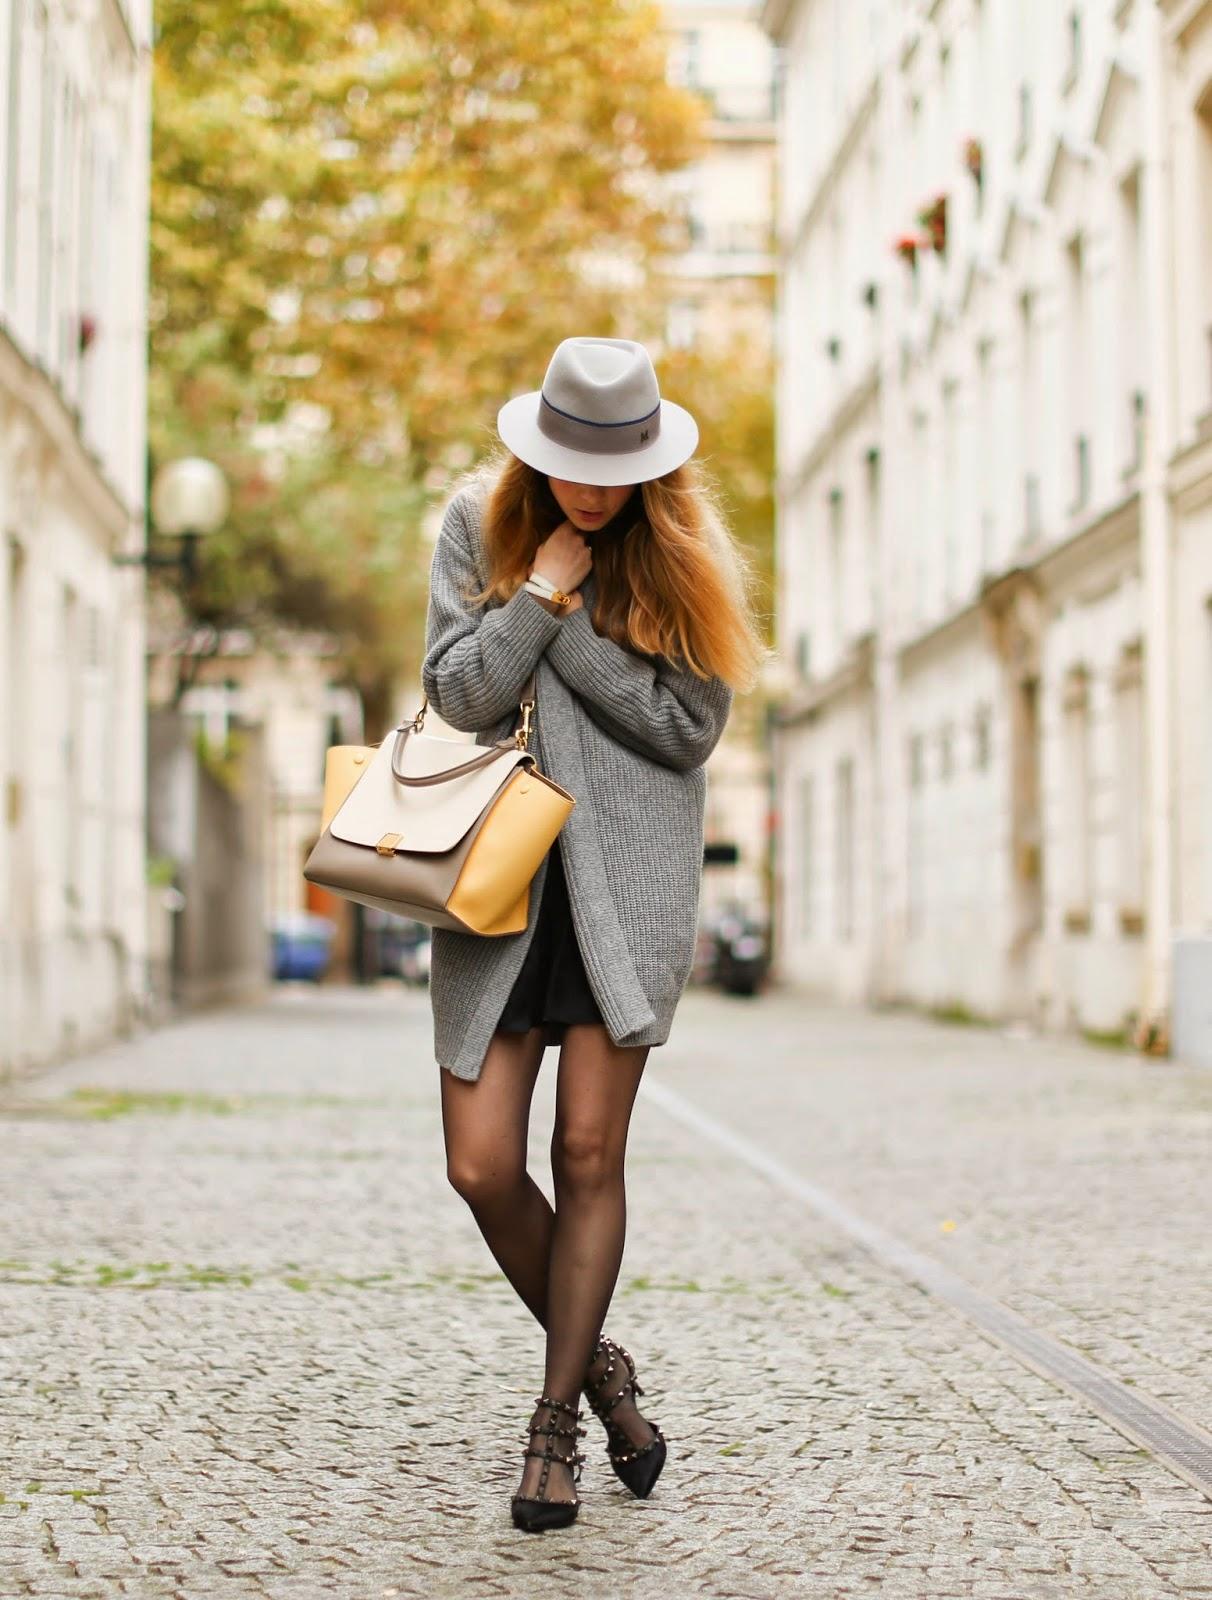 cardigan, maison michel, &otherstories, valentino, valentino rockstuds, céline, isabel marant, streetstyle, fashion blogger